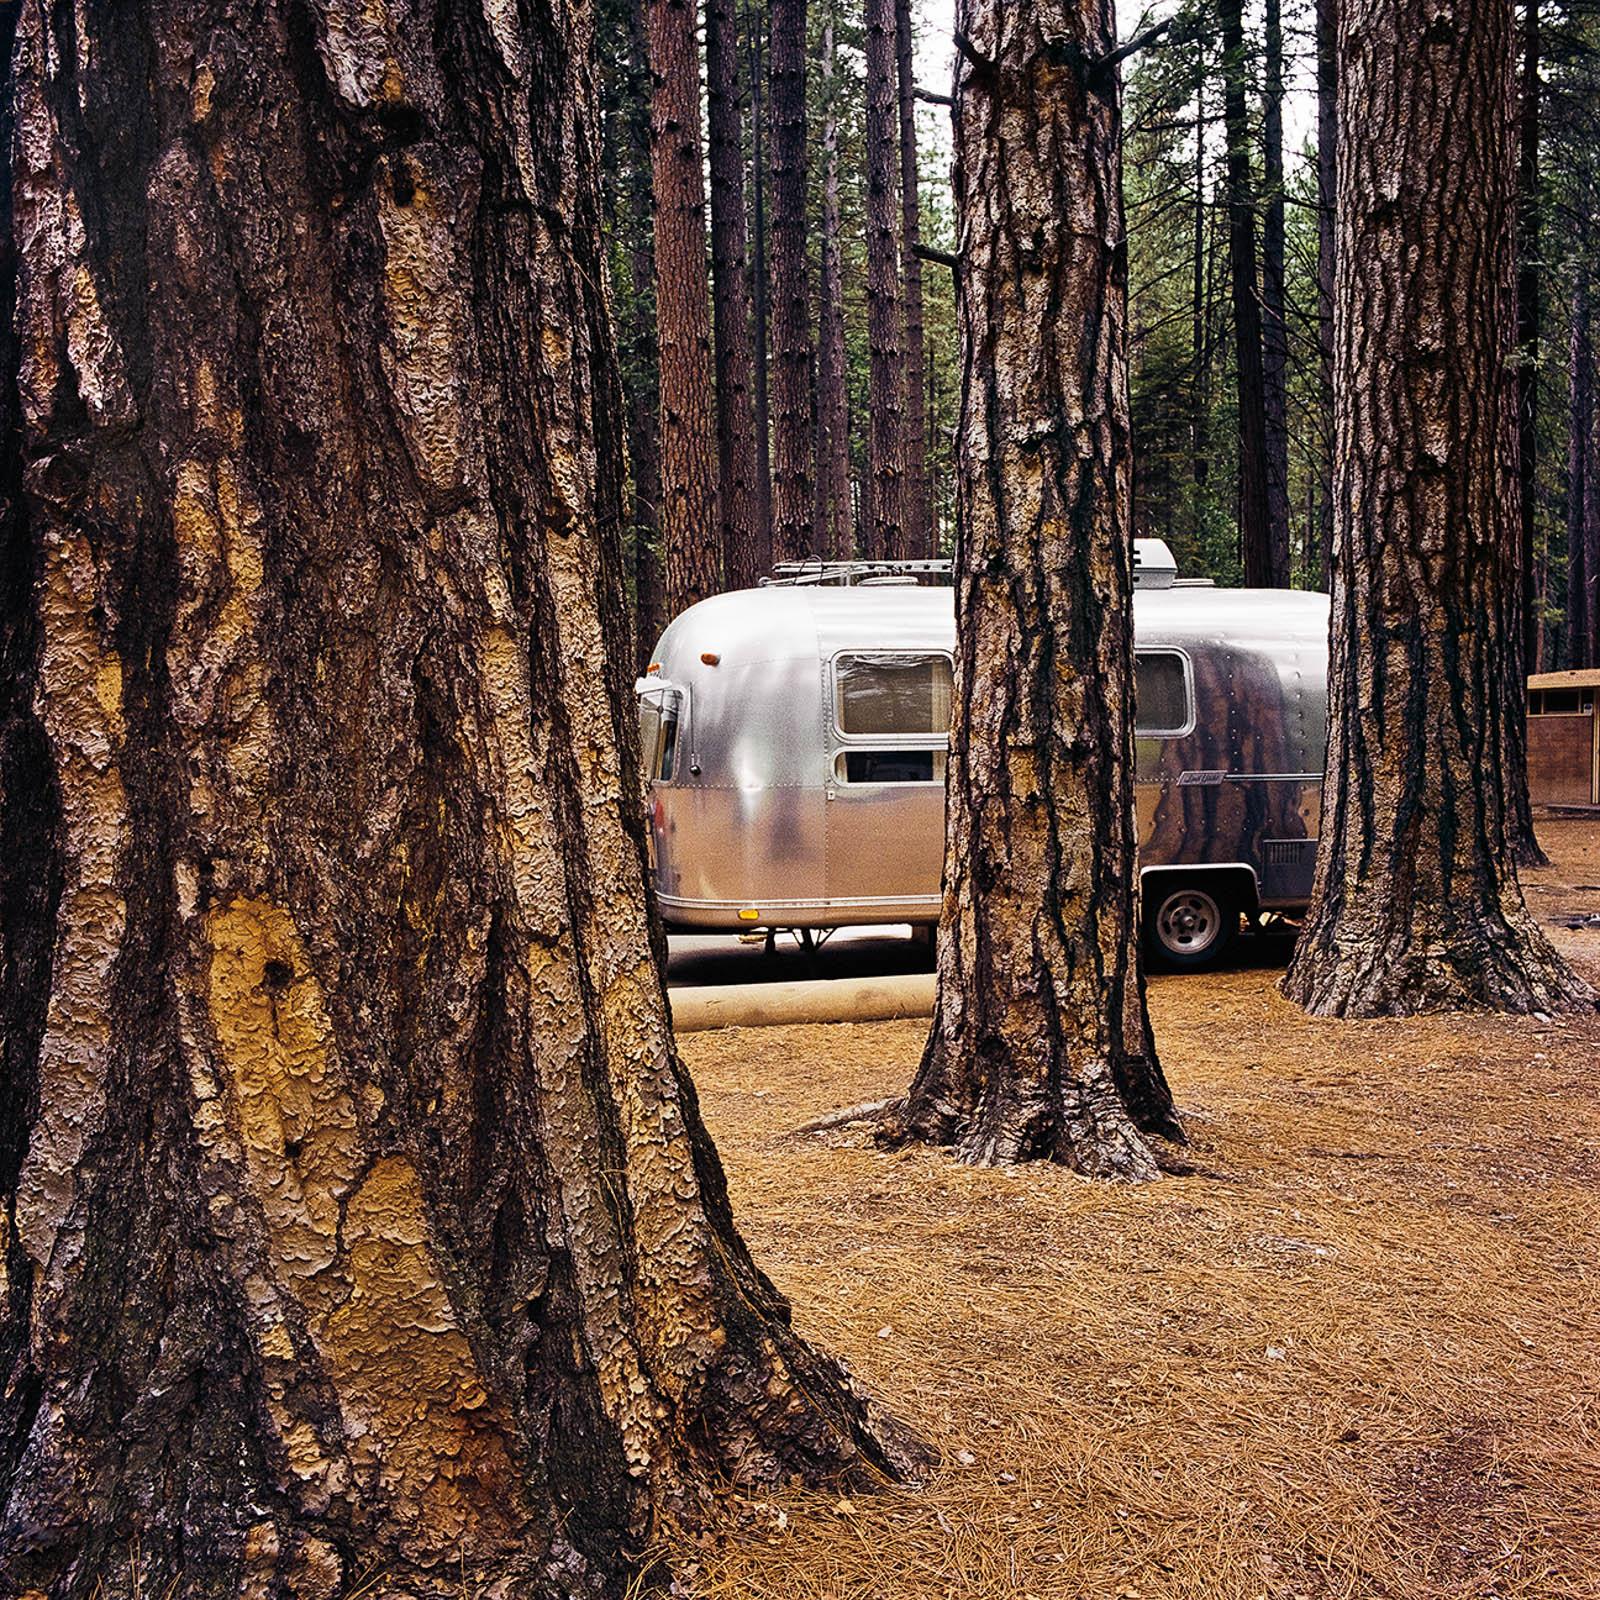 Airstream at Yosemite National Park, California 1980